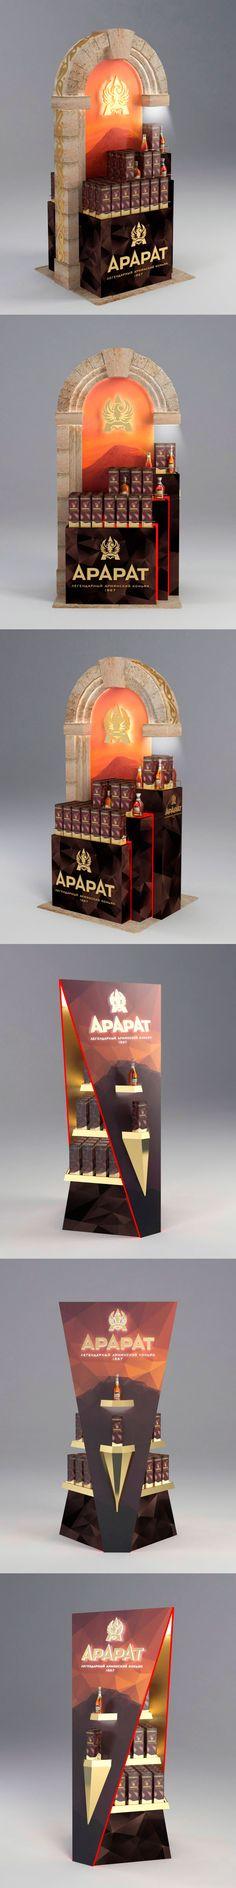 https://www.behance.net/gallery/49976965/Ararat-cognacstand